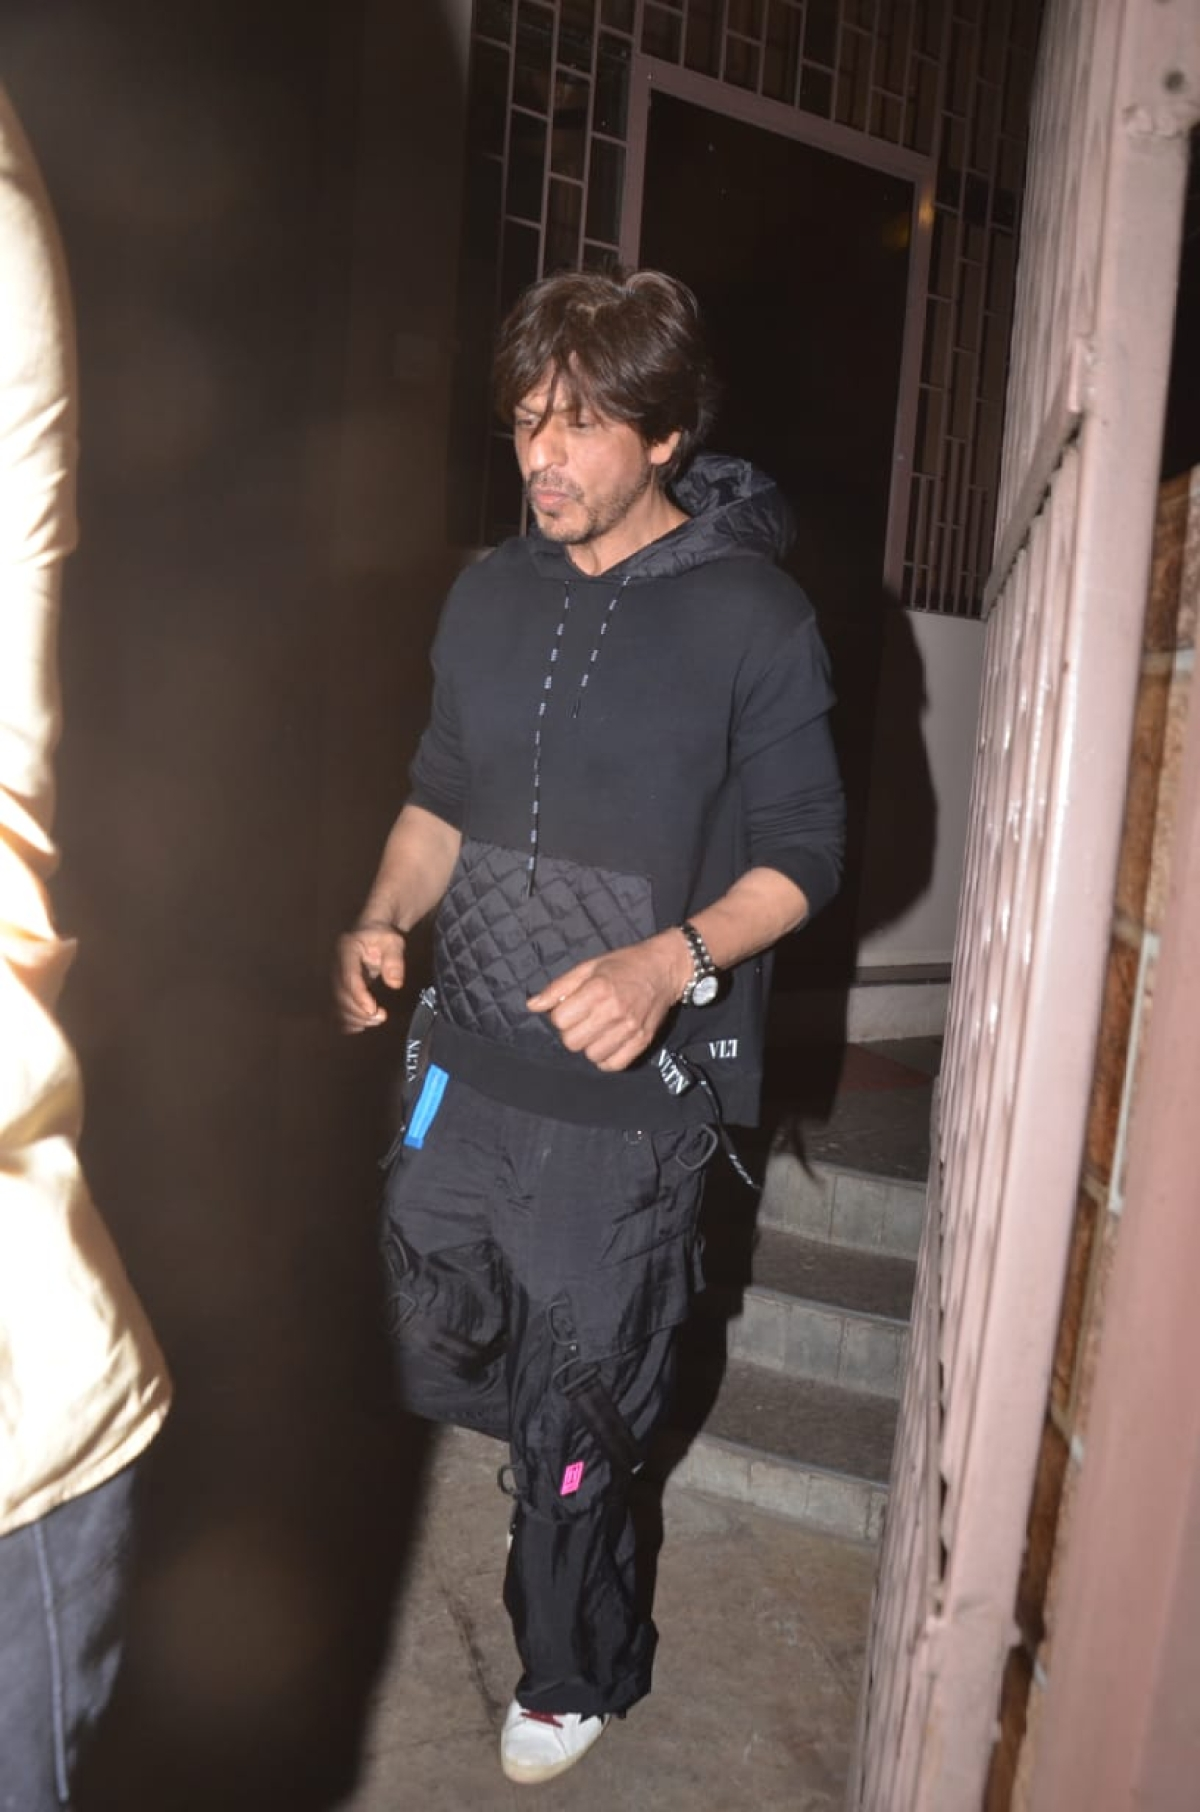 Shah Rukh Khan was snapped at dubbing studio in Bandra.